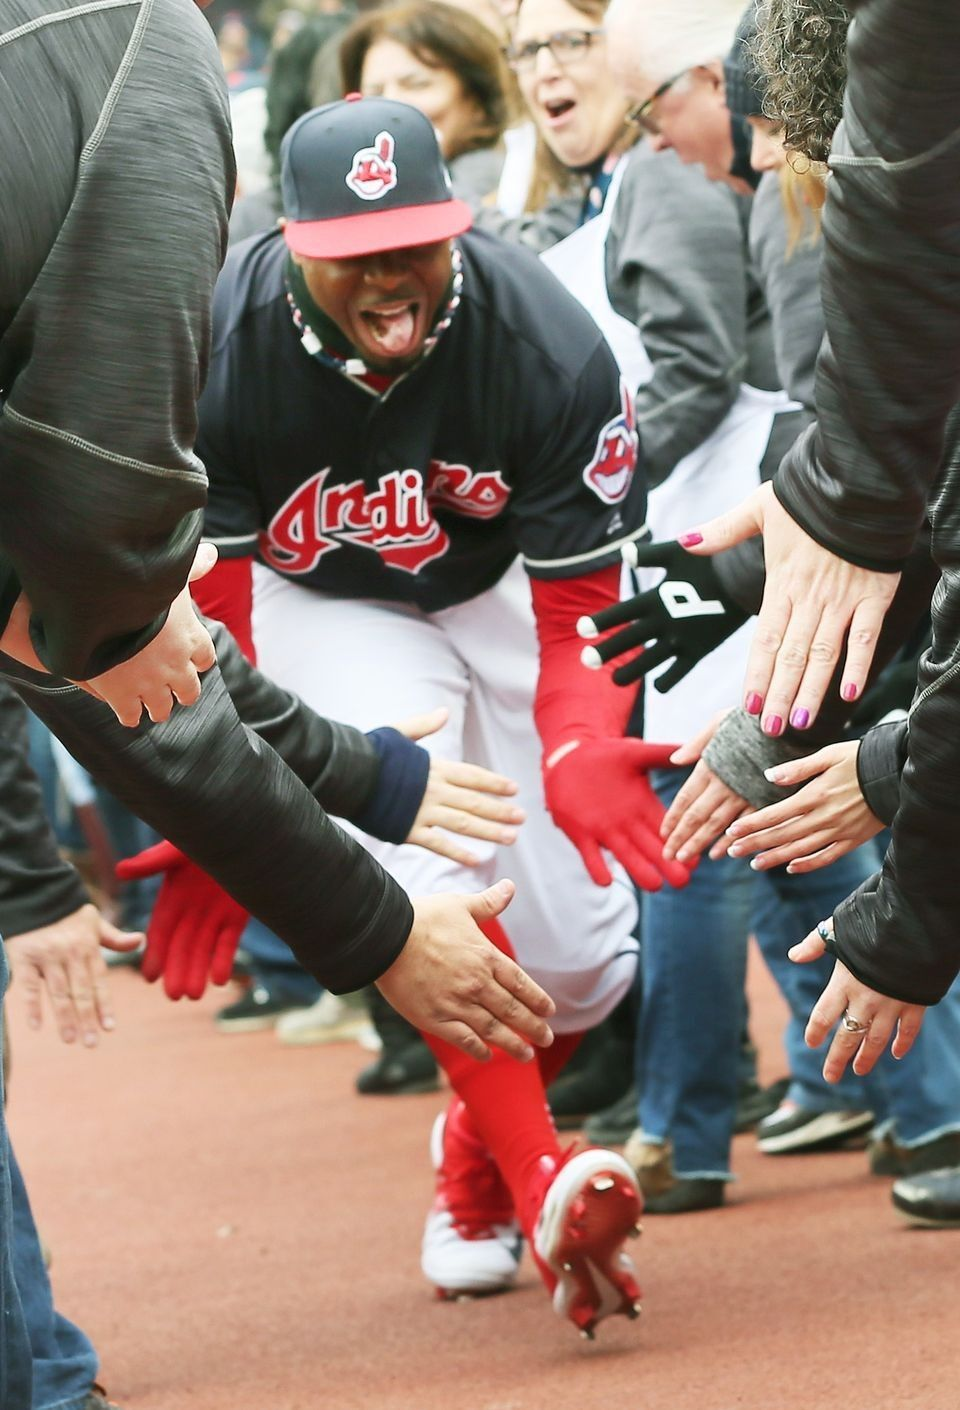 MLB fan official Cleveland indians, Cleveland indians